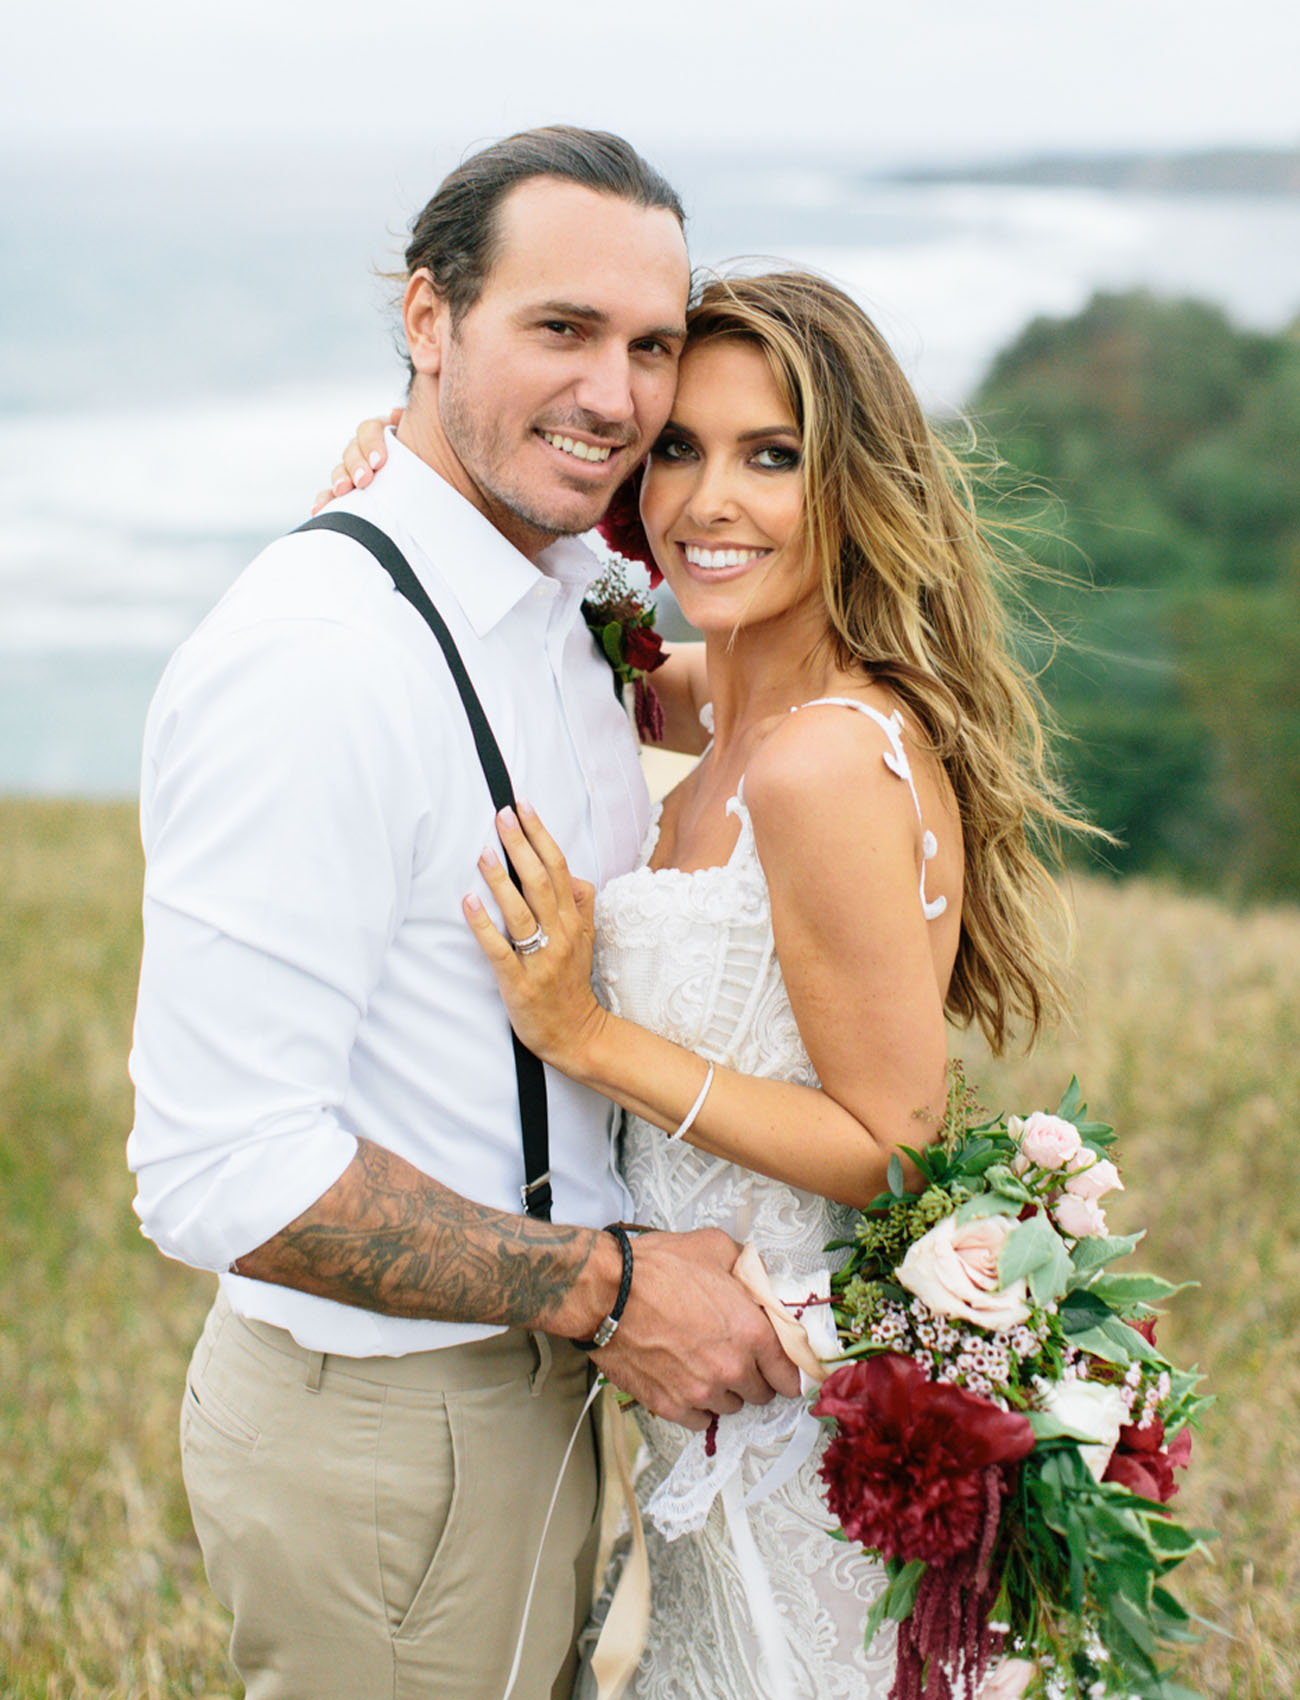 Audrina Patridge + Corey Bohan's Boho Chic Kauai Wedding